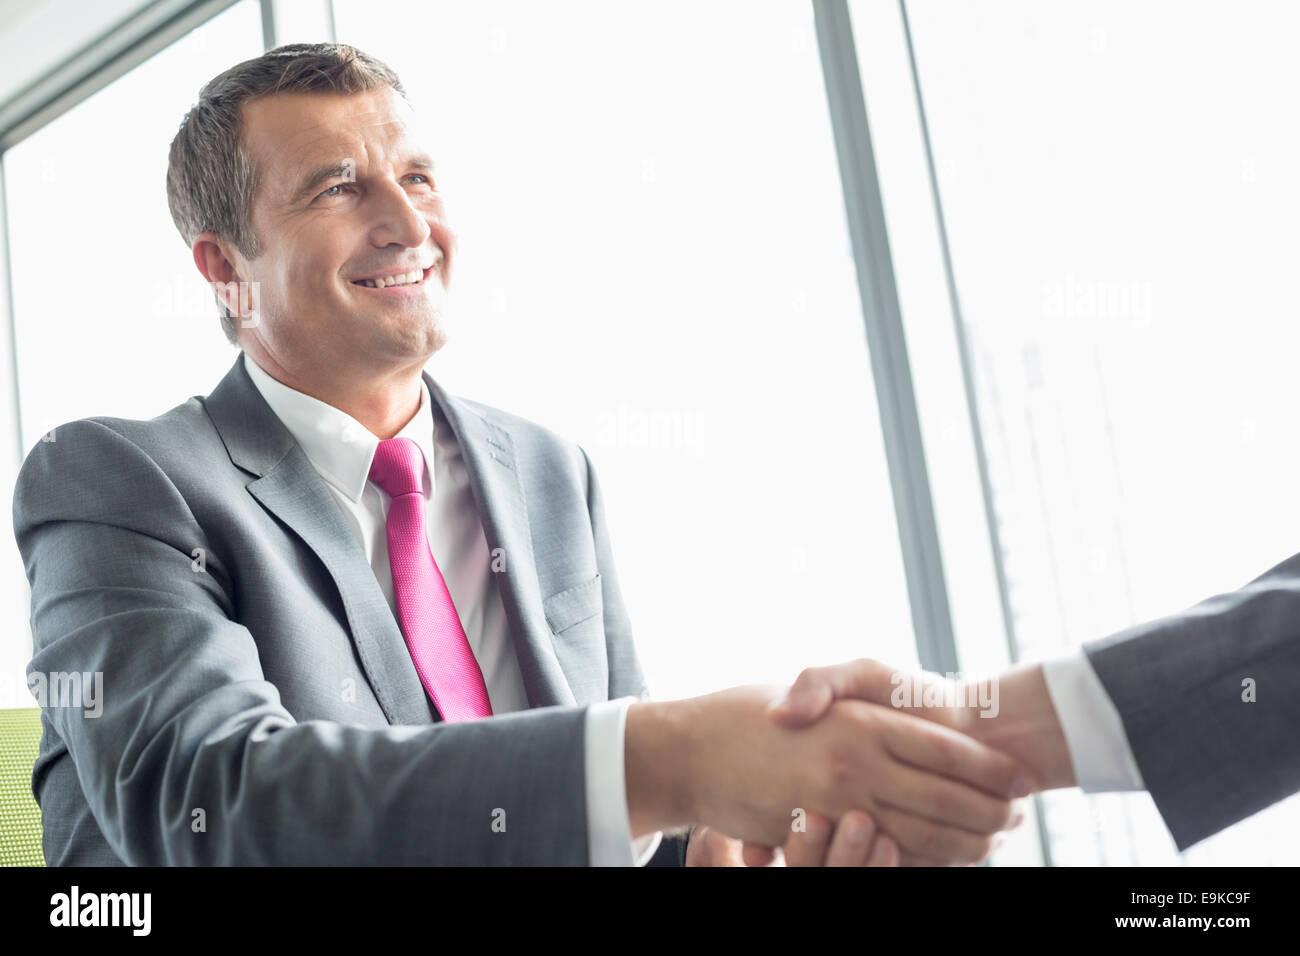 Lächelnd reifer Geschäftsmann Händeschütteln mit Partner im Büro Stockbild